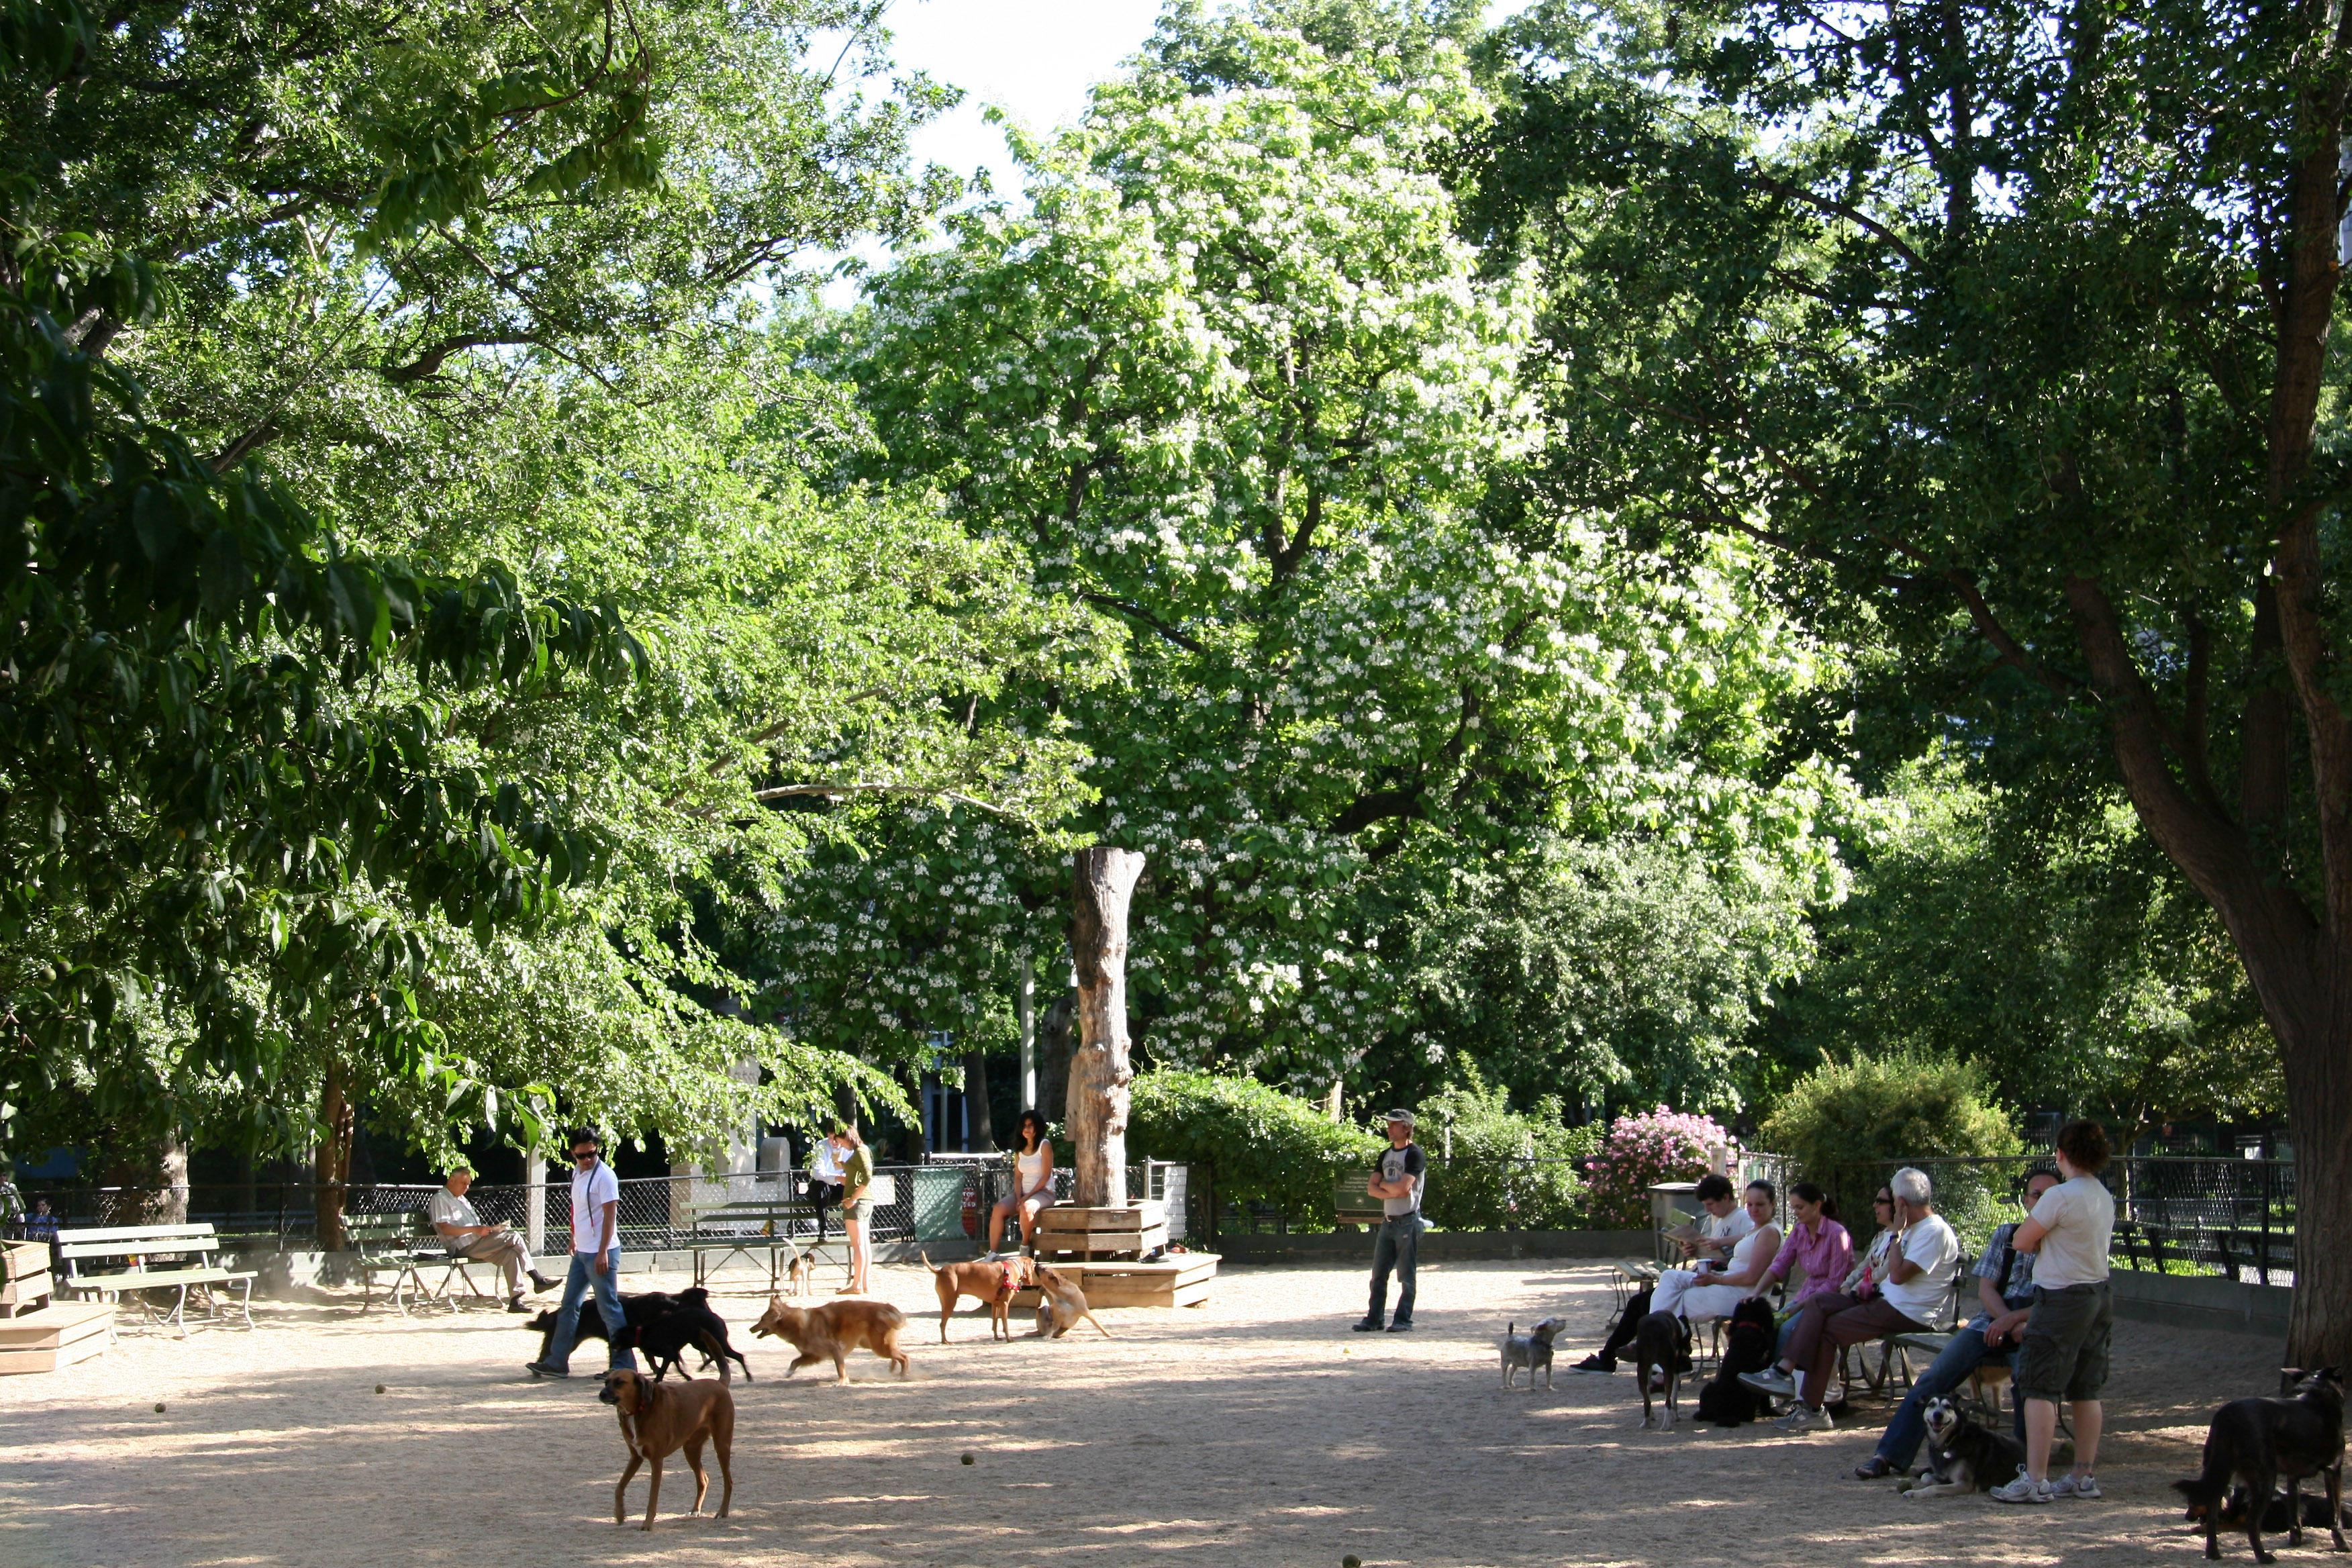 Dog Run with Catalpa Tree in Bloom